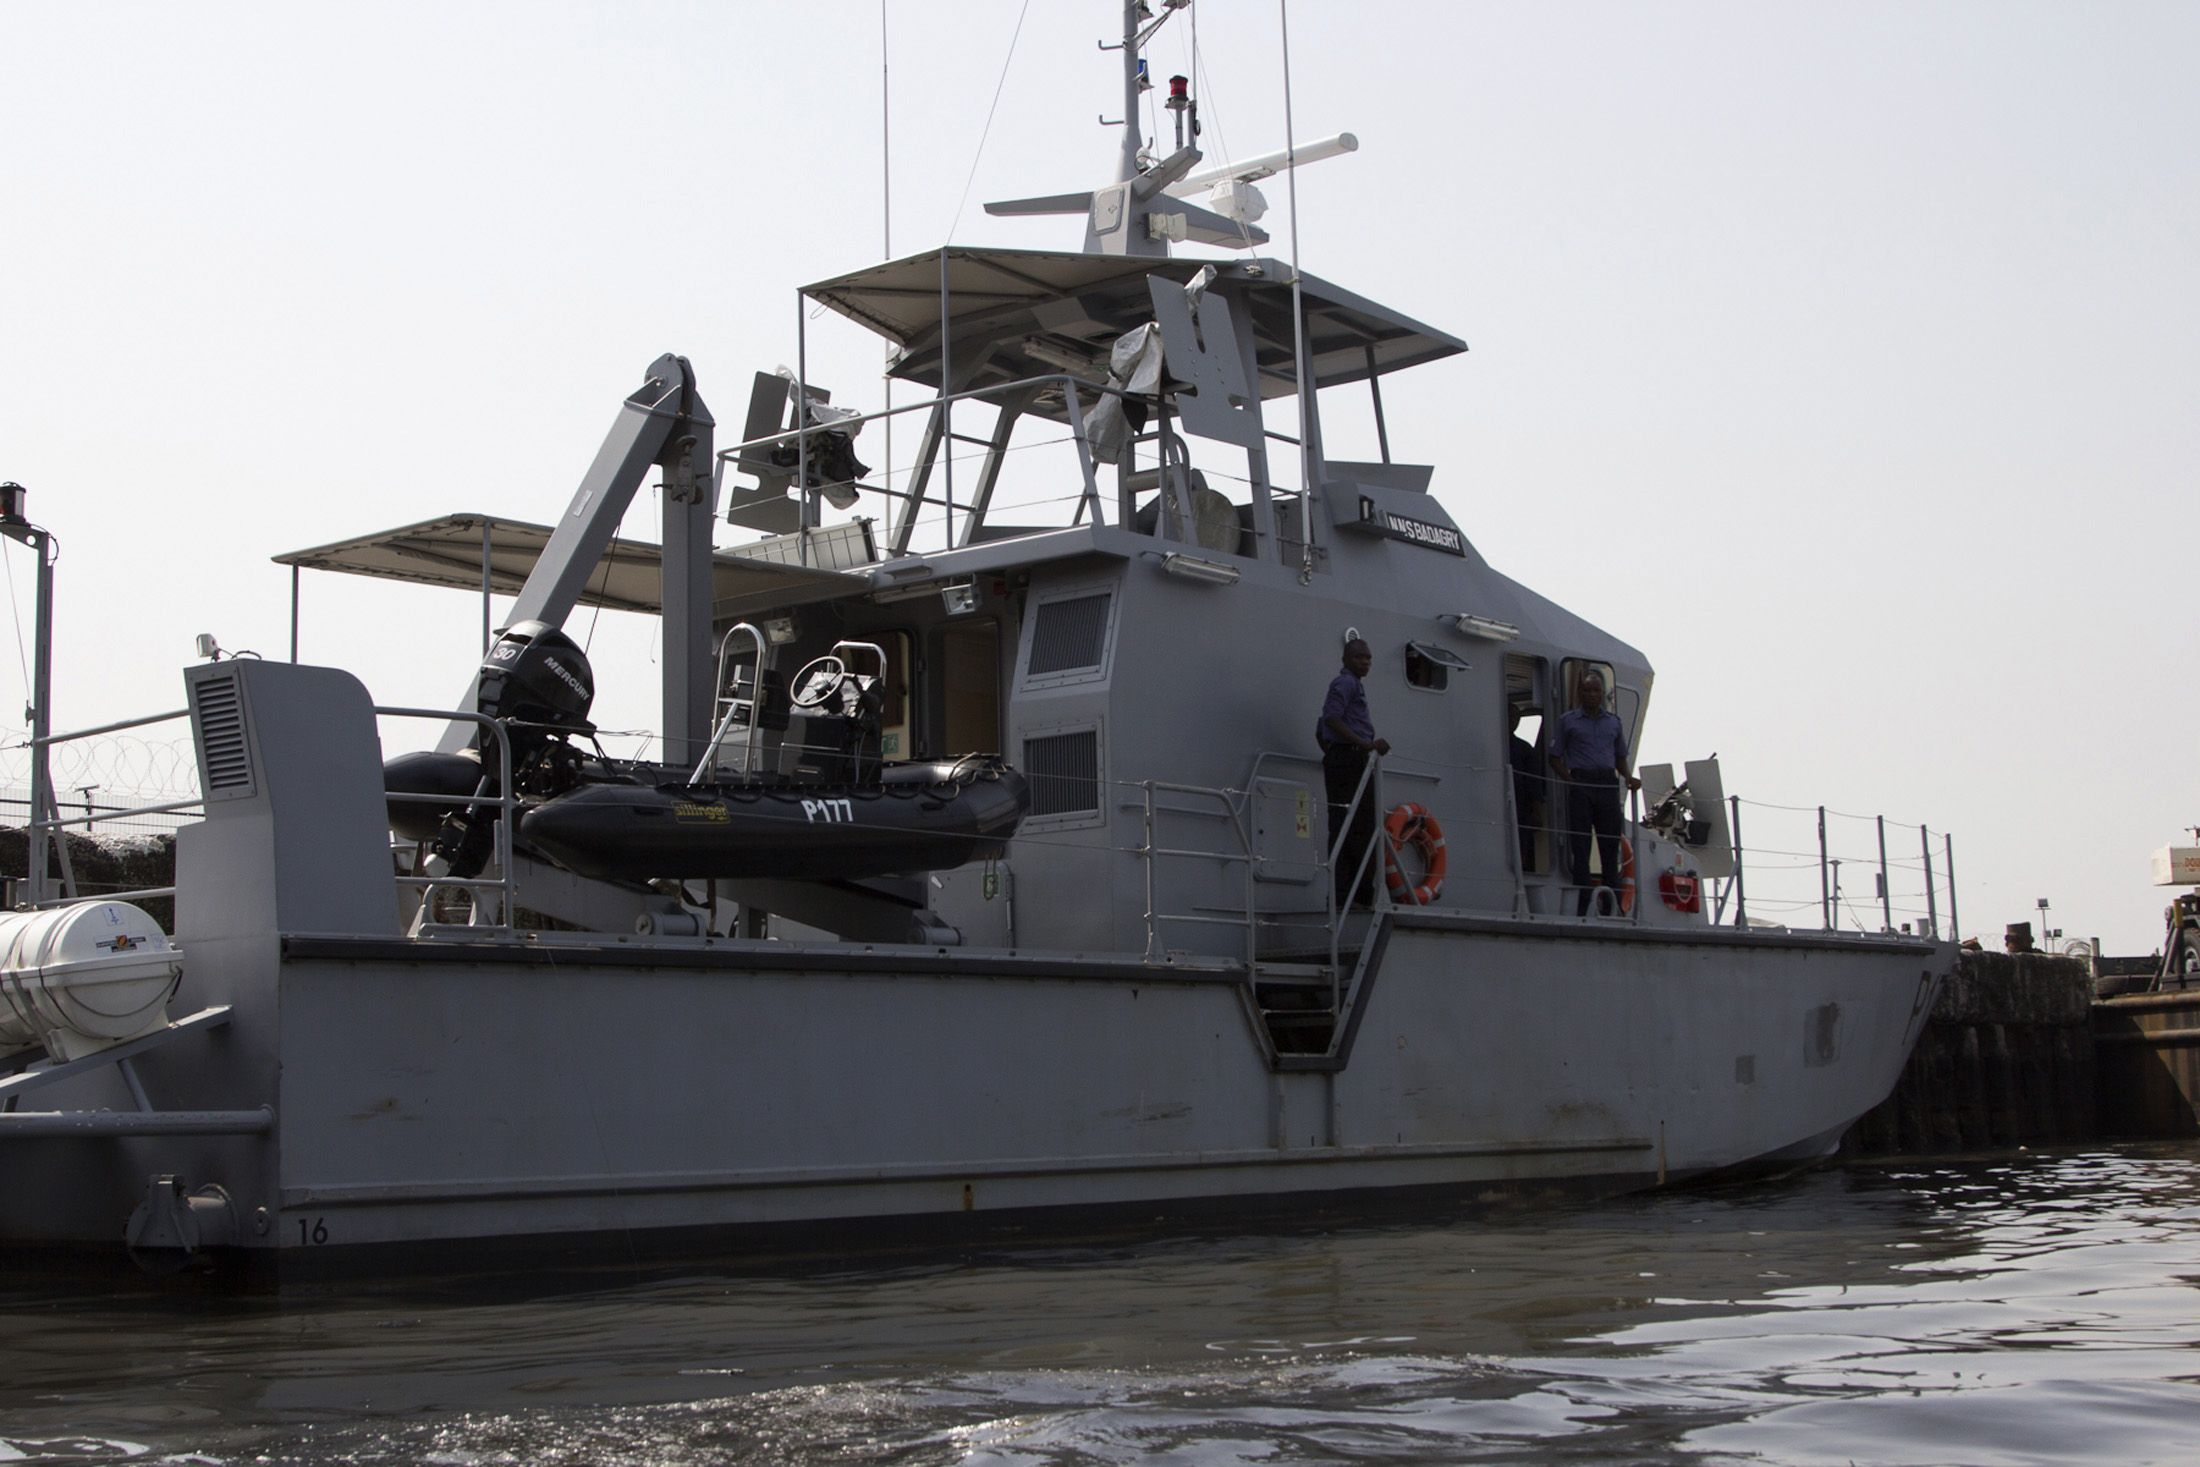 A naval boat off the coast of Nigeria's Bayelsa state.